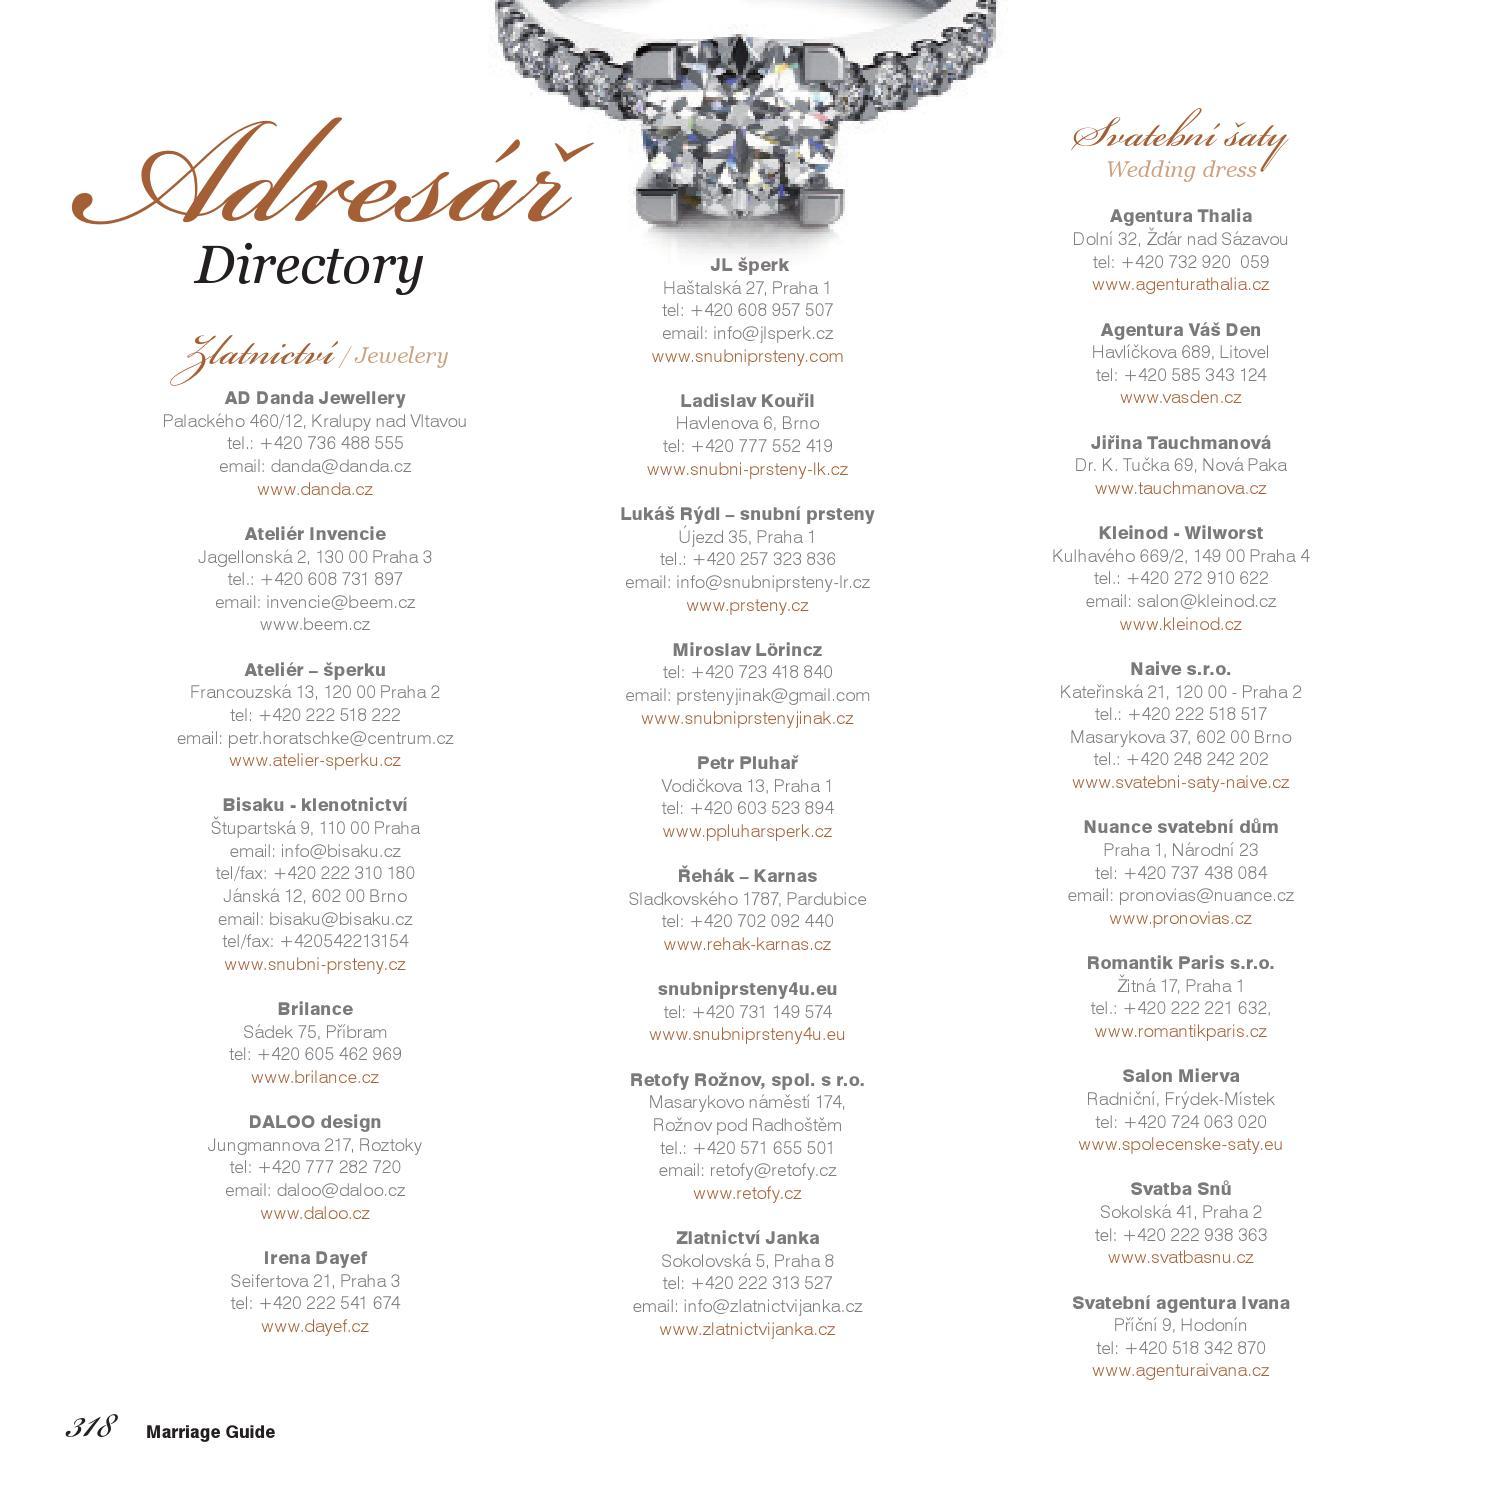 Marriage Guide Wedding Podzim 2013 By Kollman Partners S R O Issuu